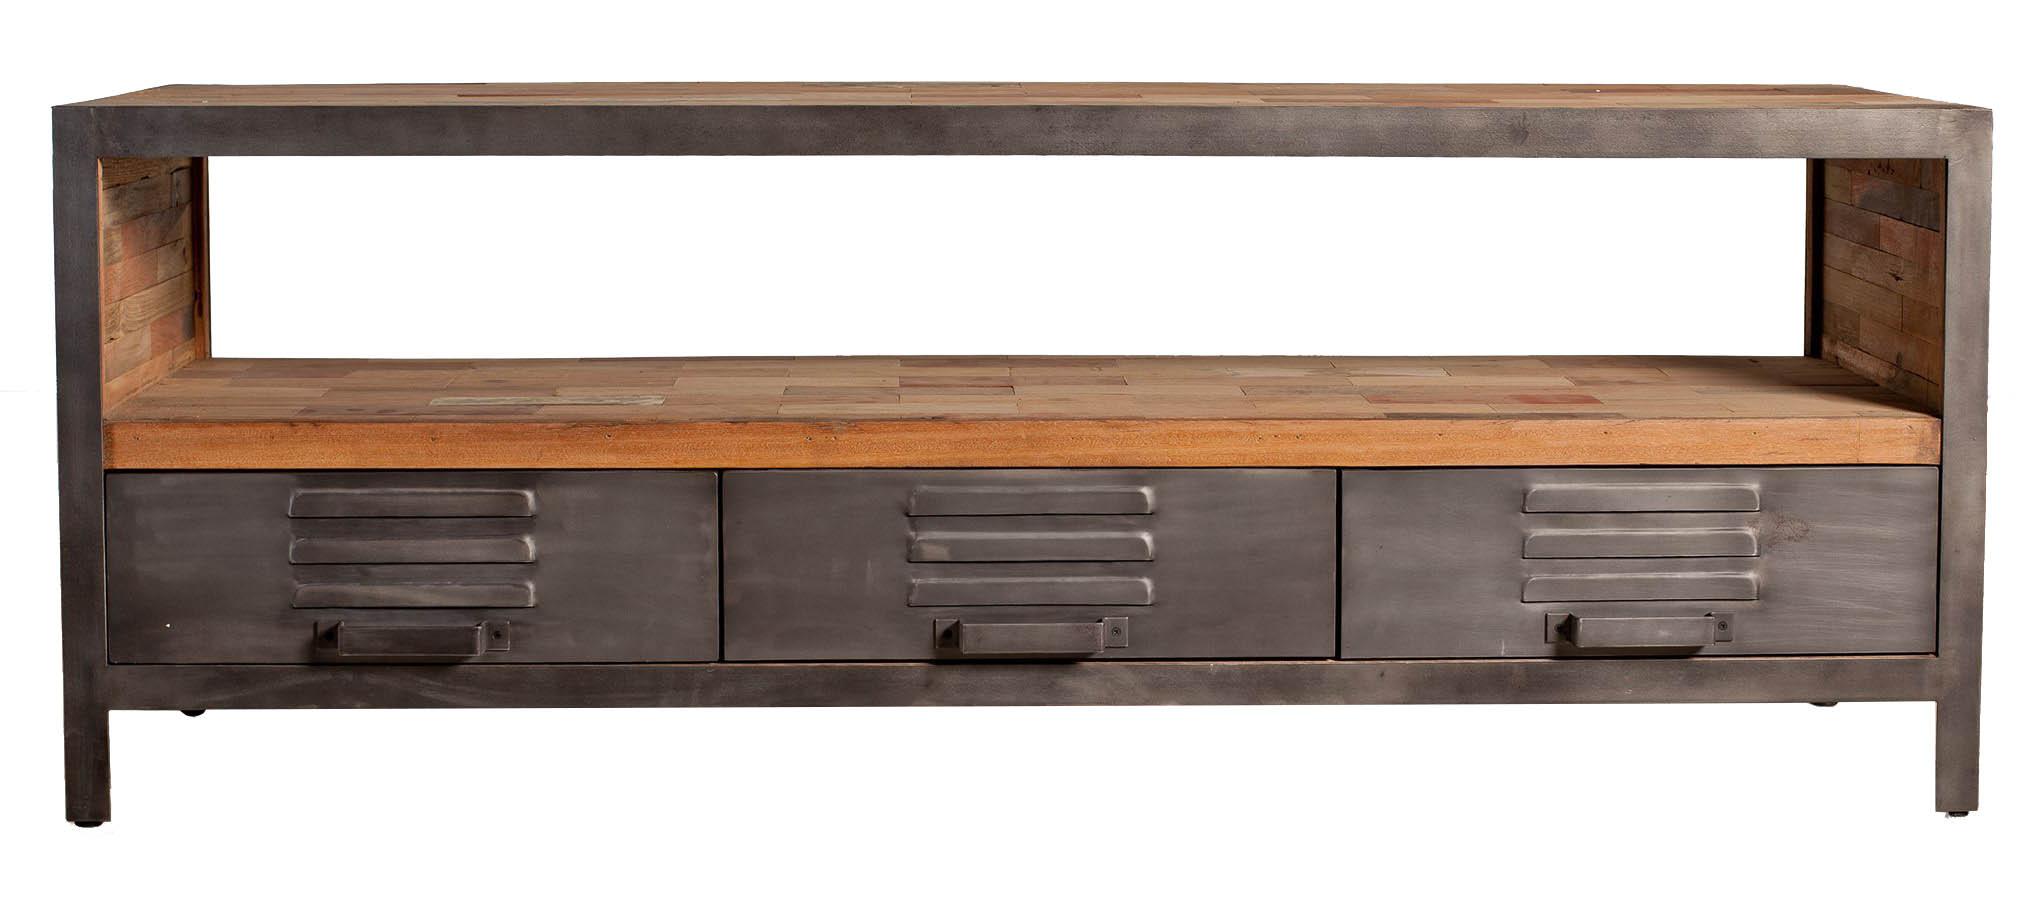 meuble tv metal bois recycle 3 tiroirs caravelle